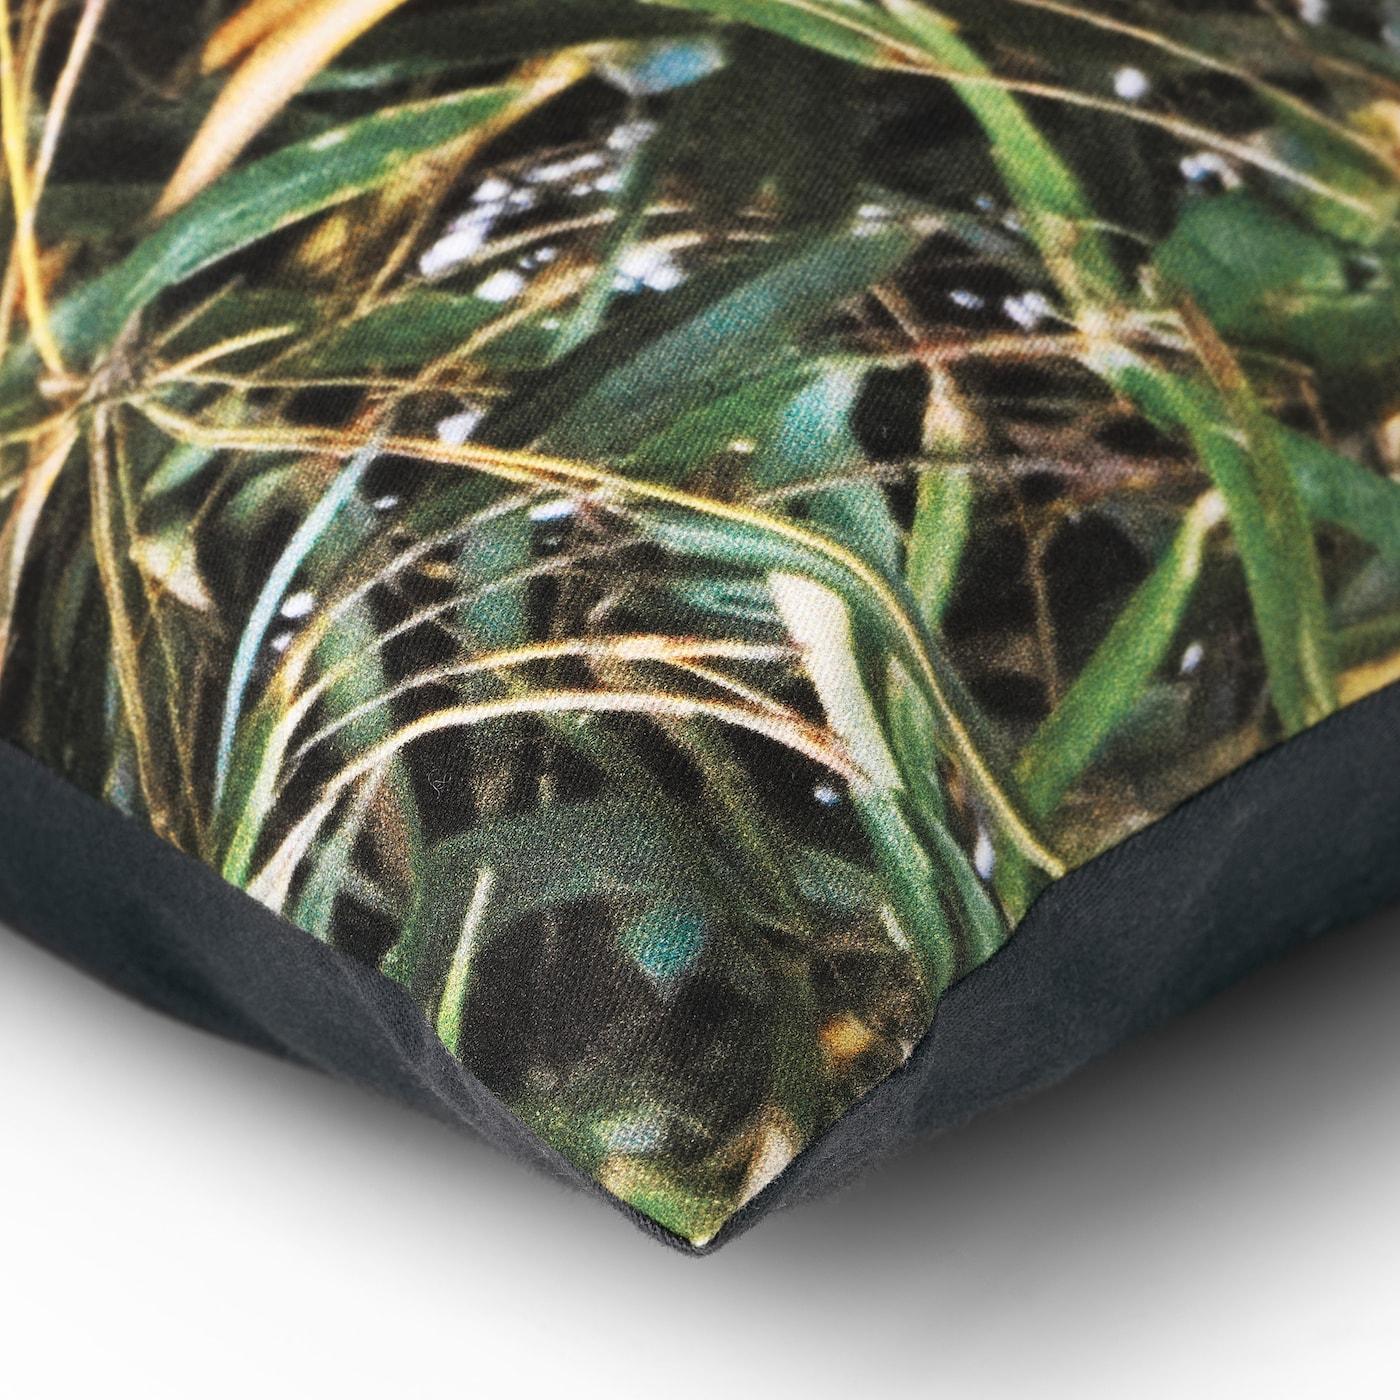 URSKOG cushion Panda multicolour 50 cm 50 cm 350 g 475 g